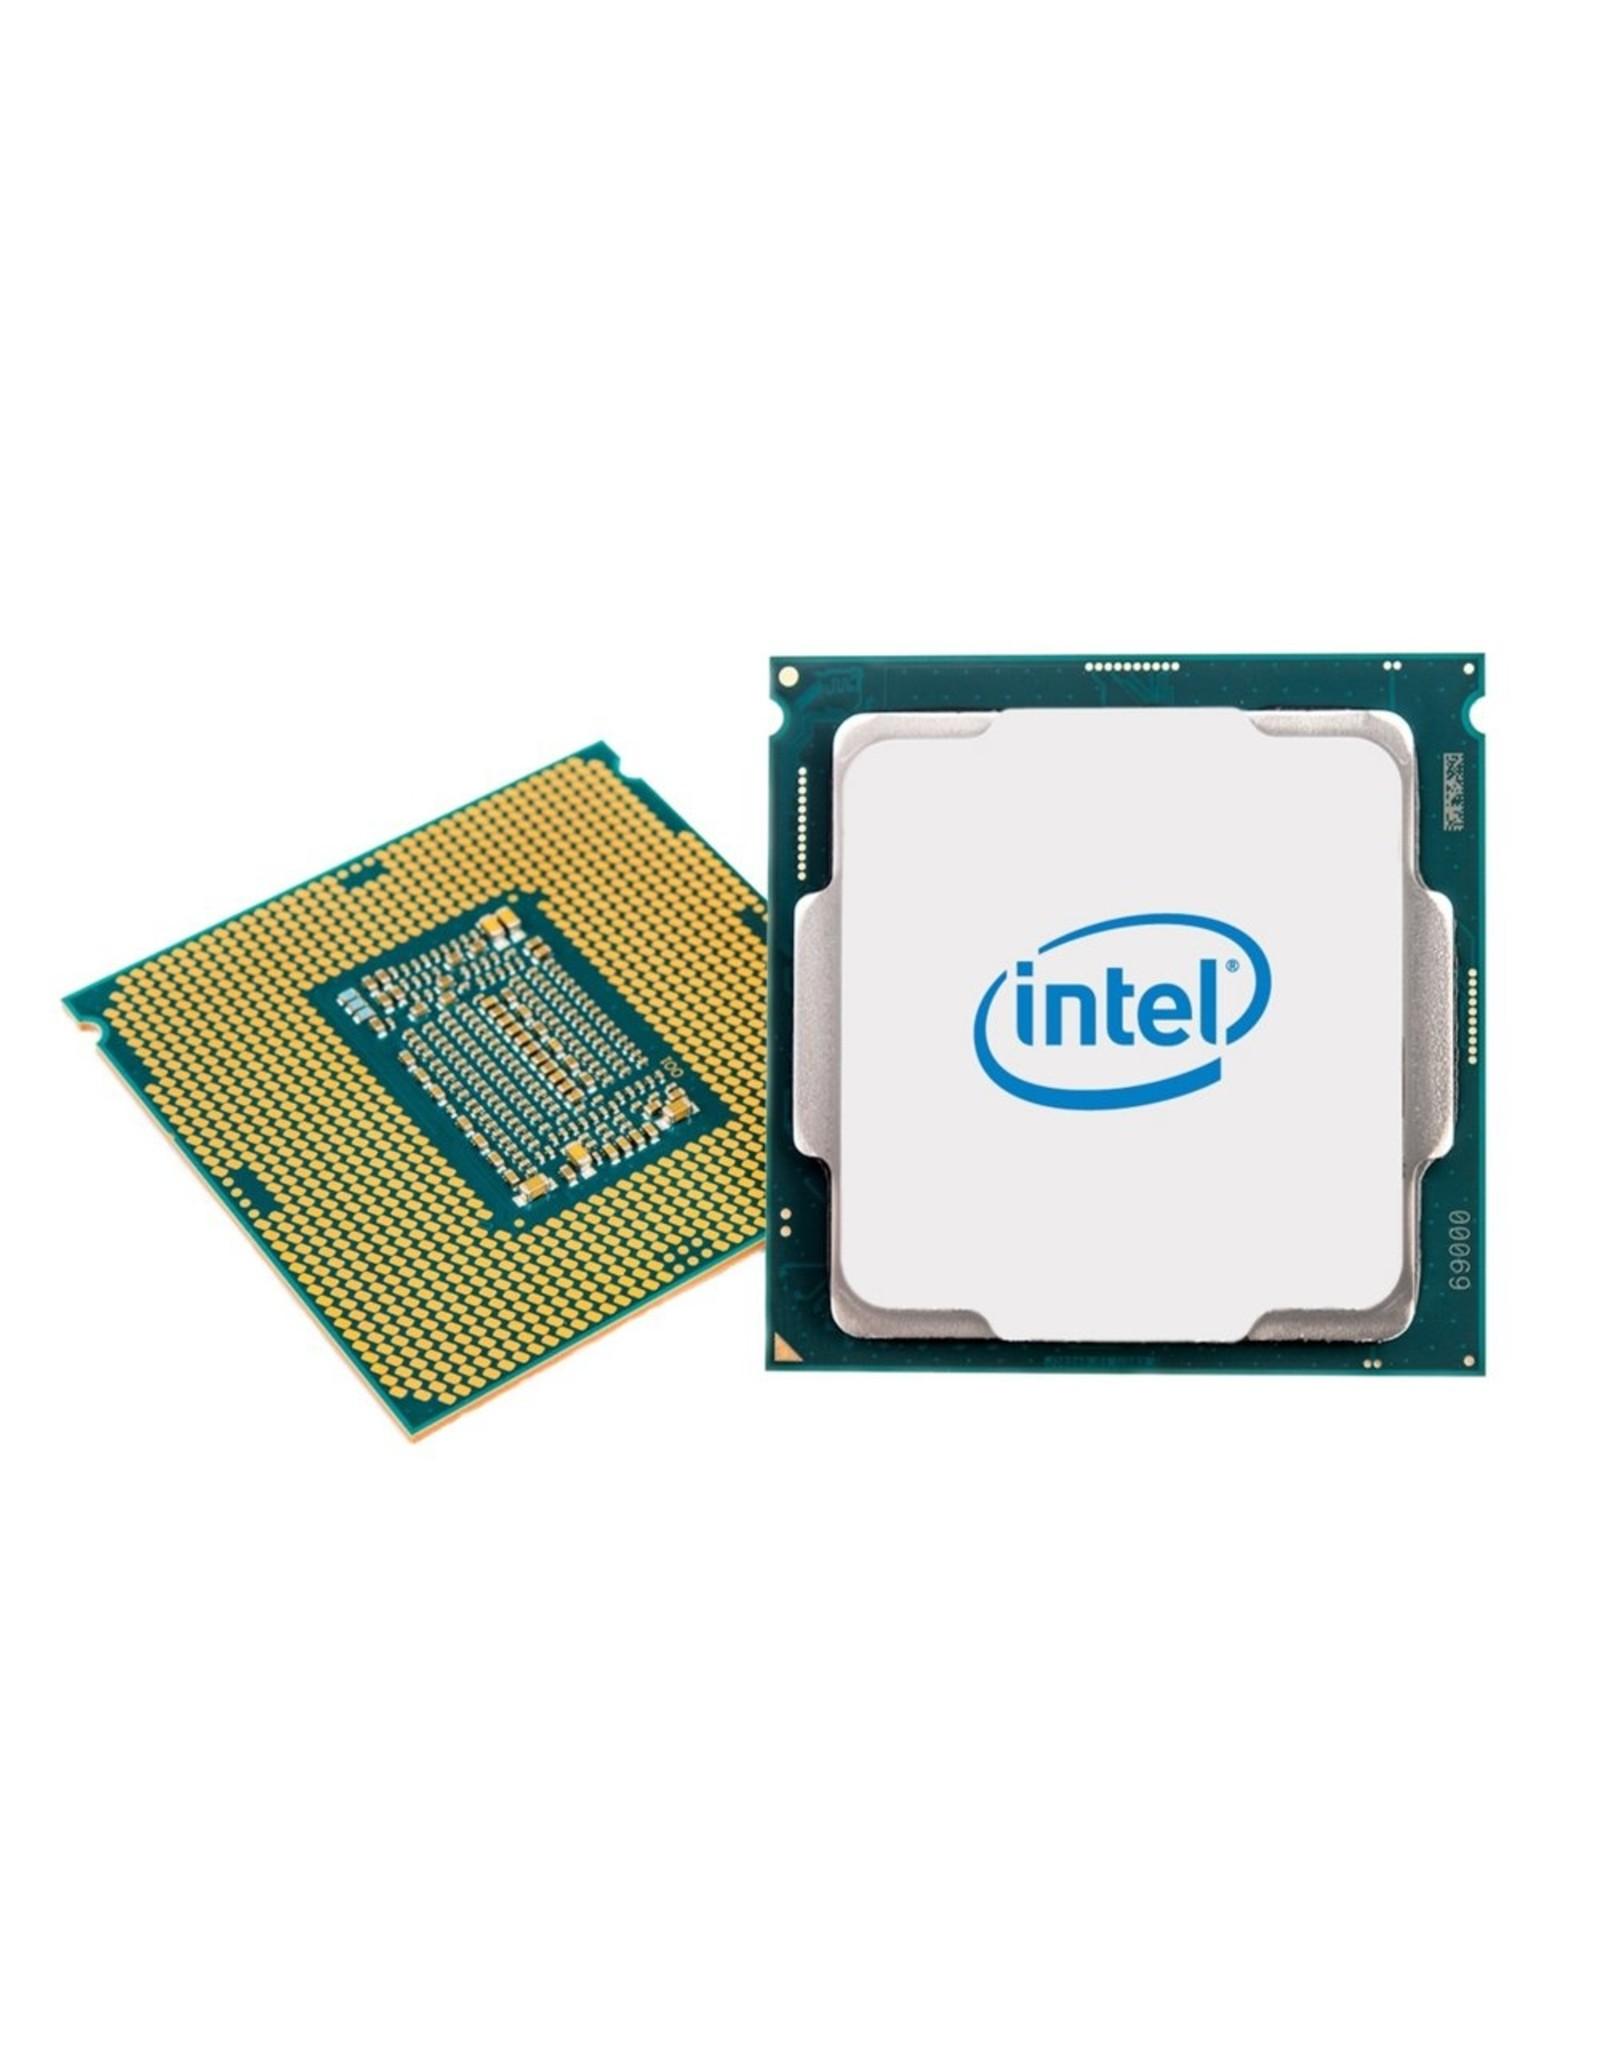 Intel CPU ® Core™Celeron G5925 10th/3.6Ghz /2Core/LGA1200 Box